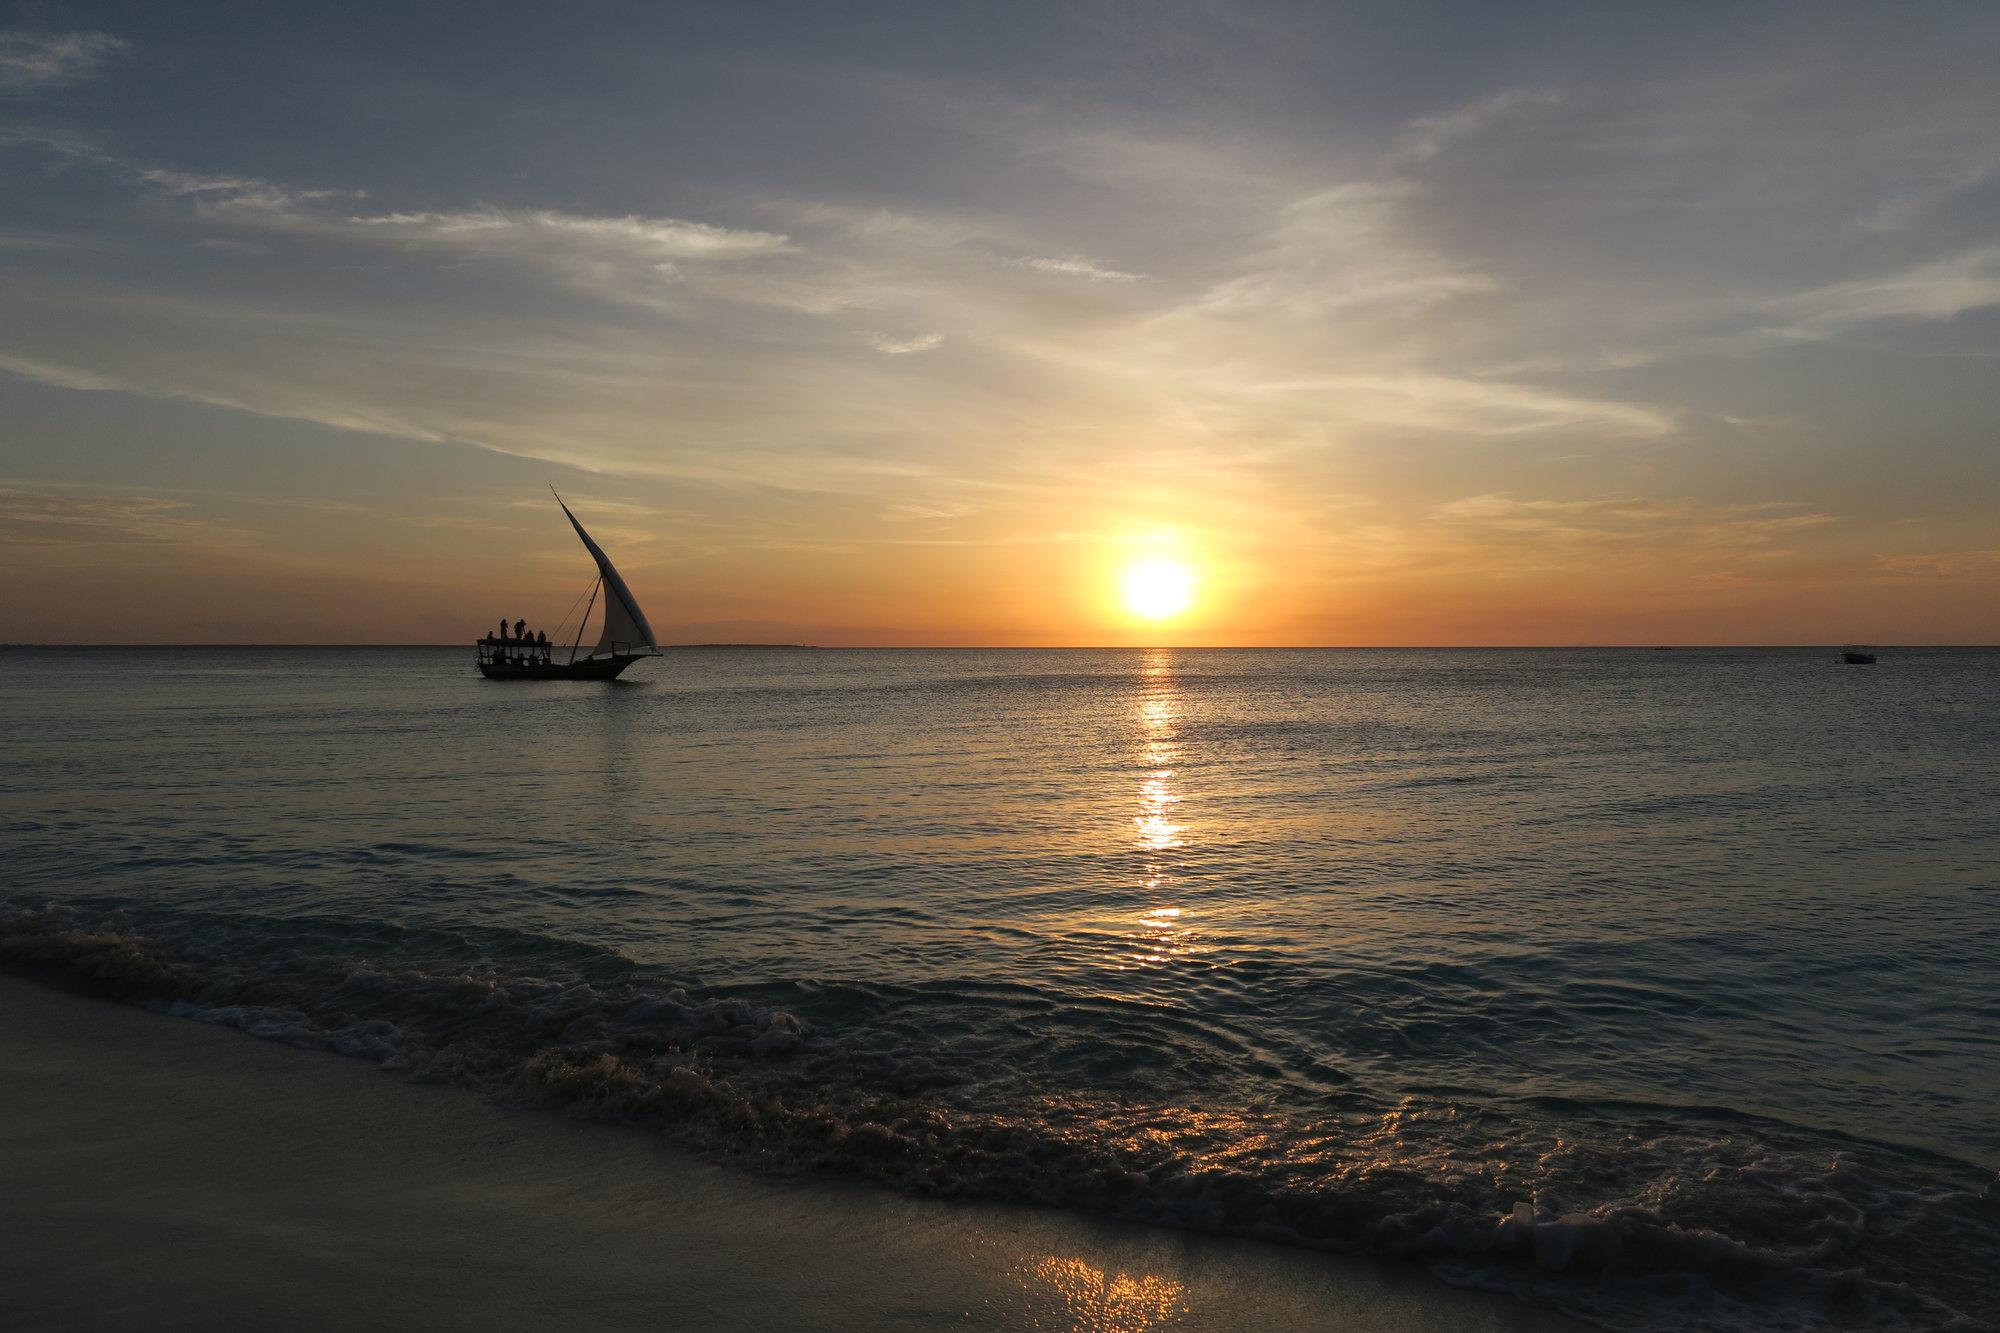 západ slunce na pláži Nungwi